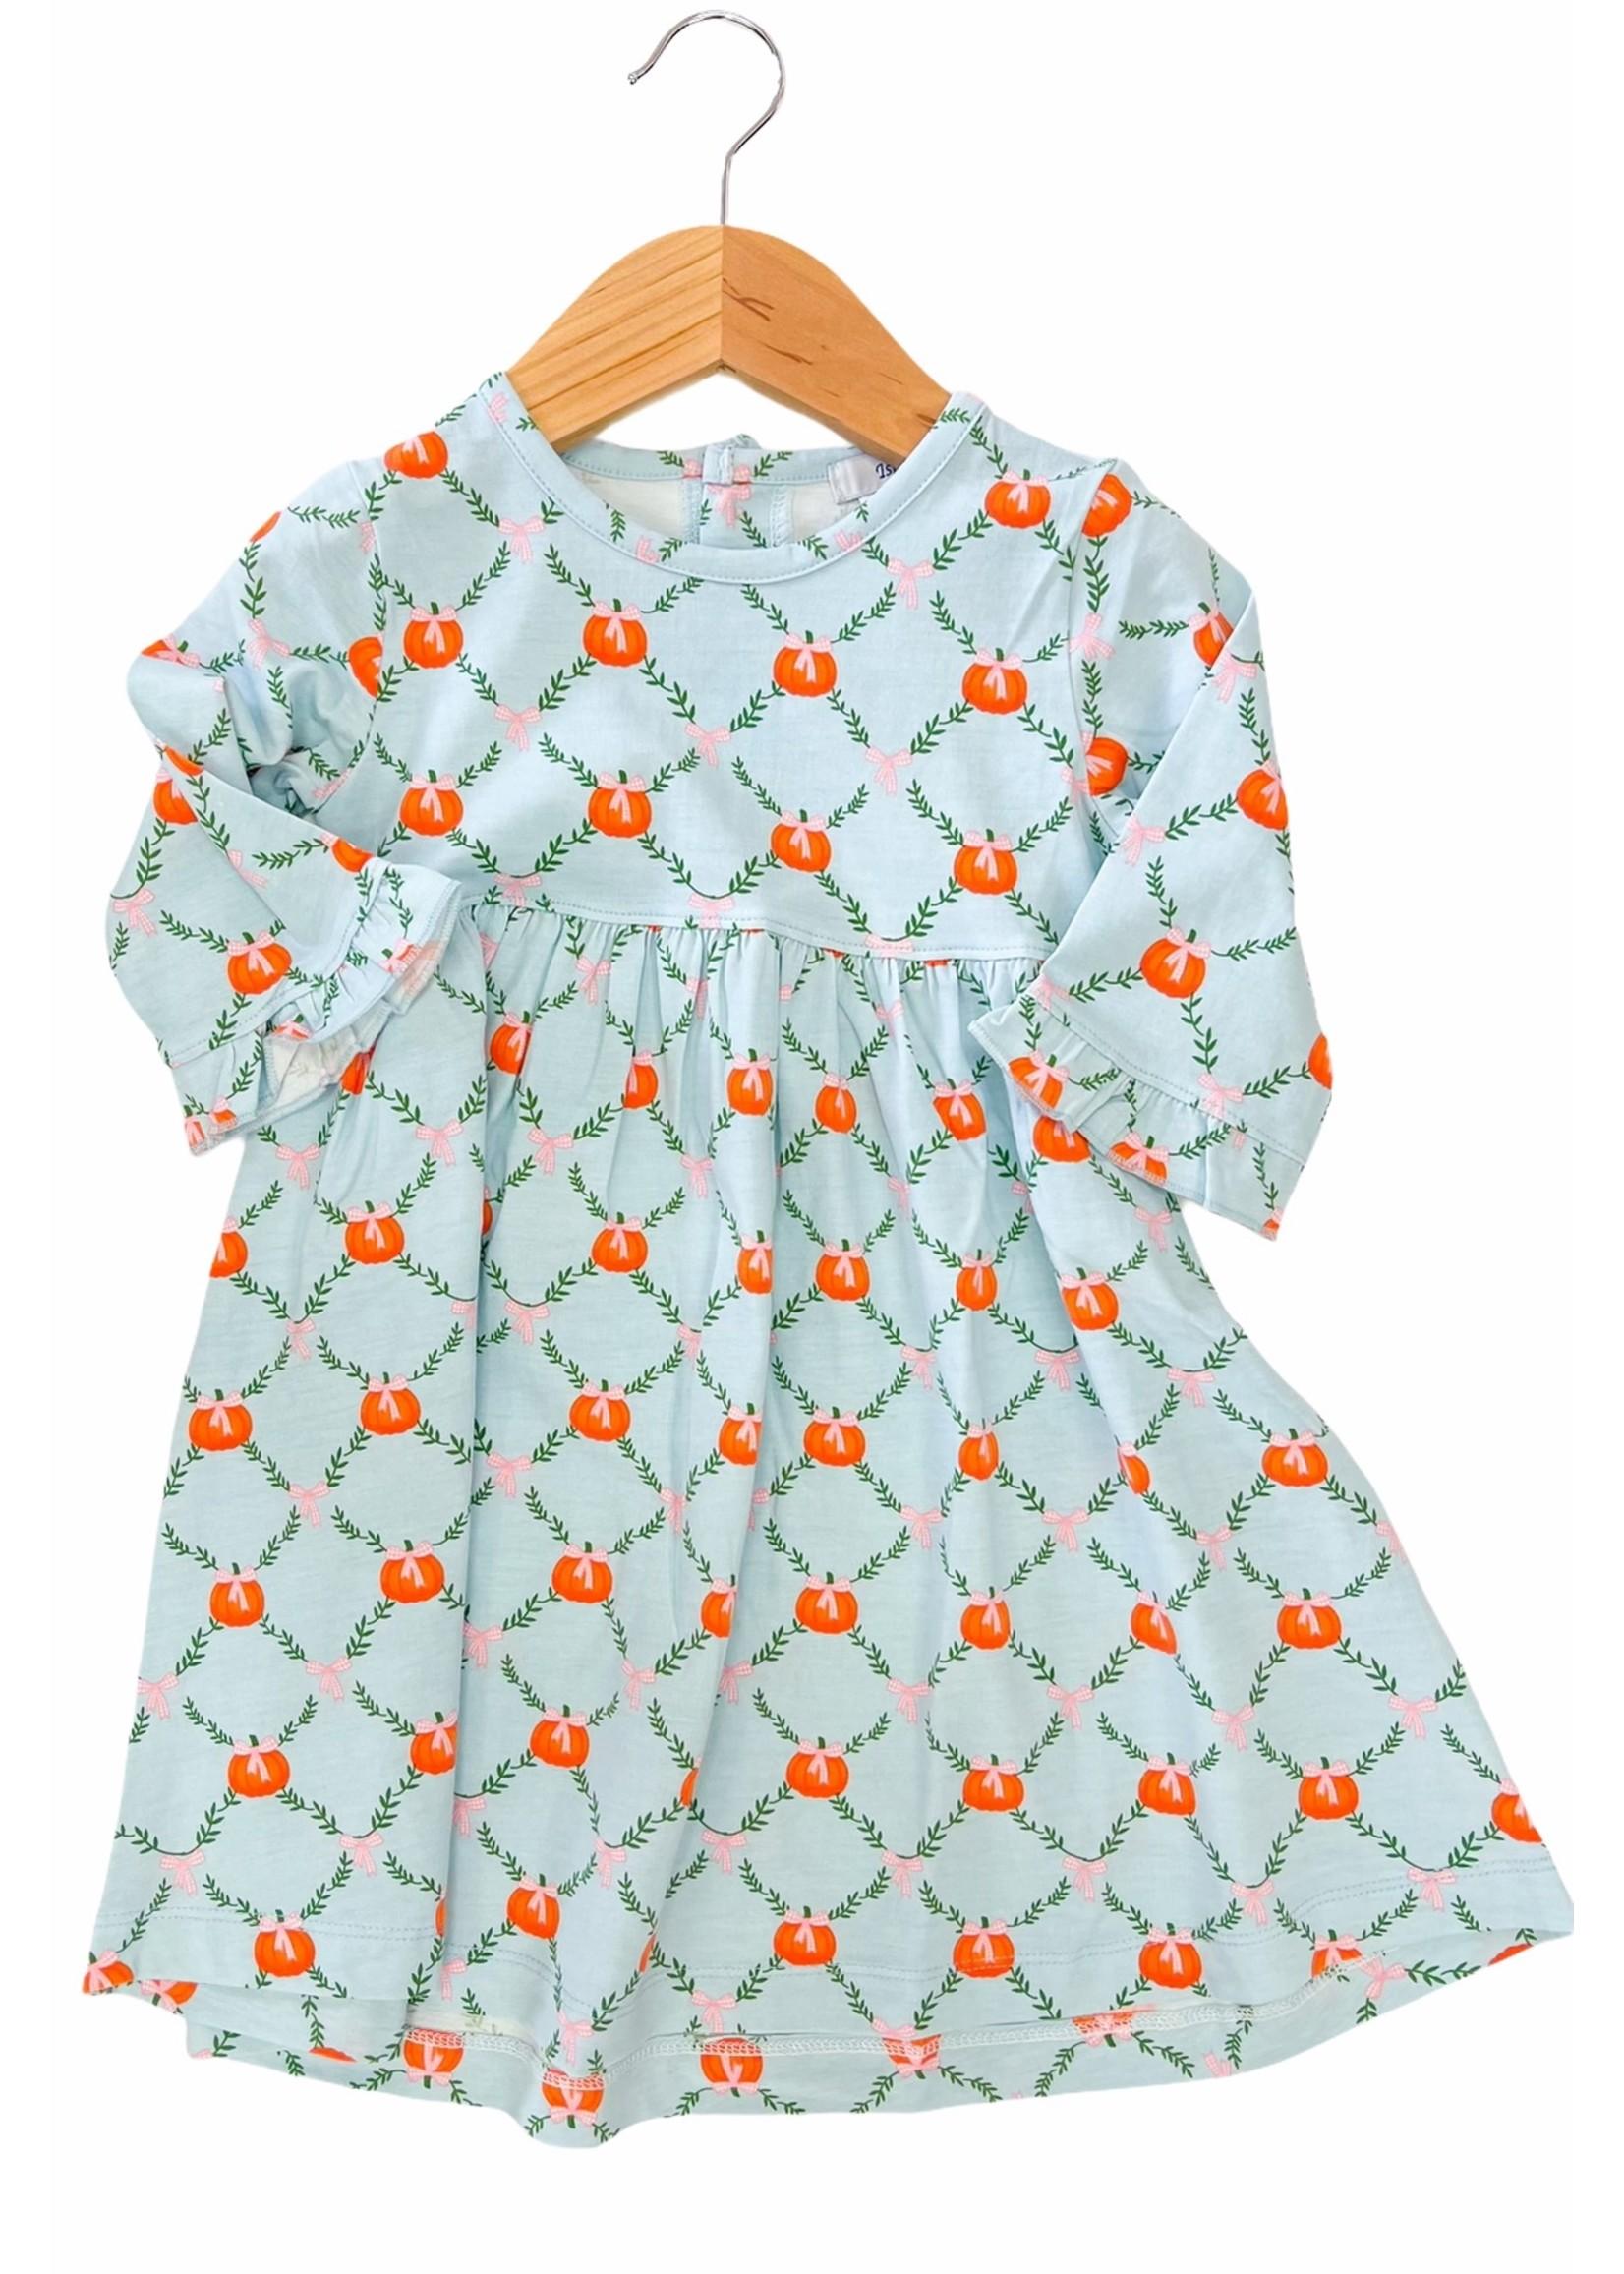 Ishtex Pumpkin Empire Dress